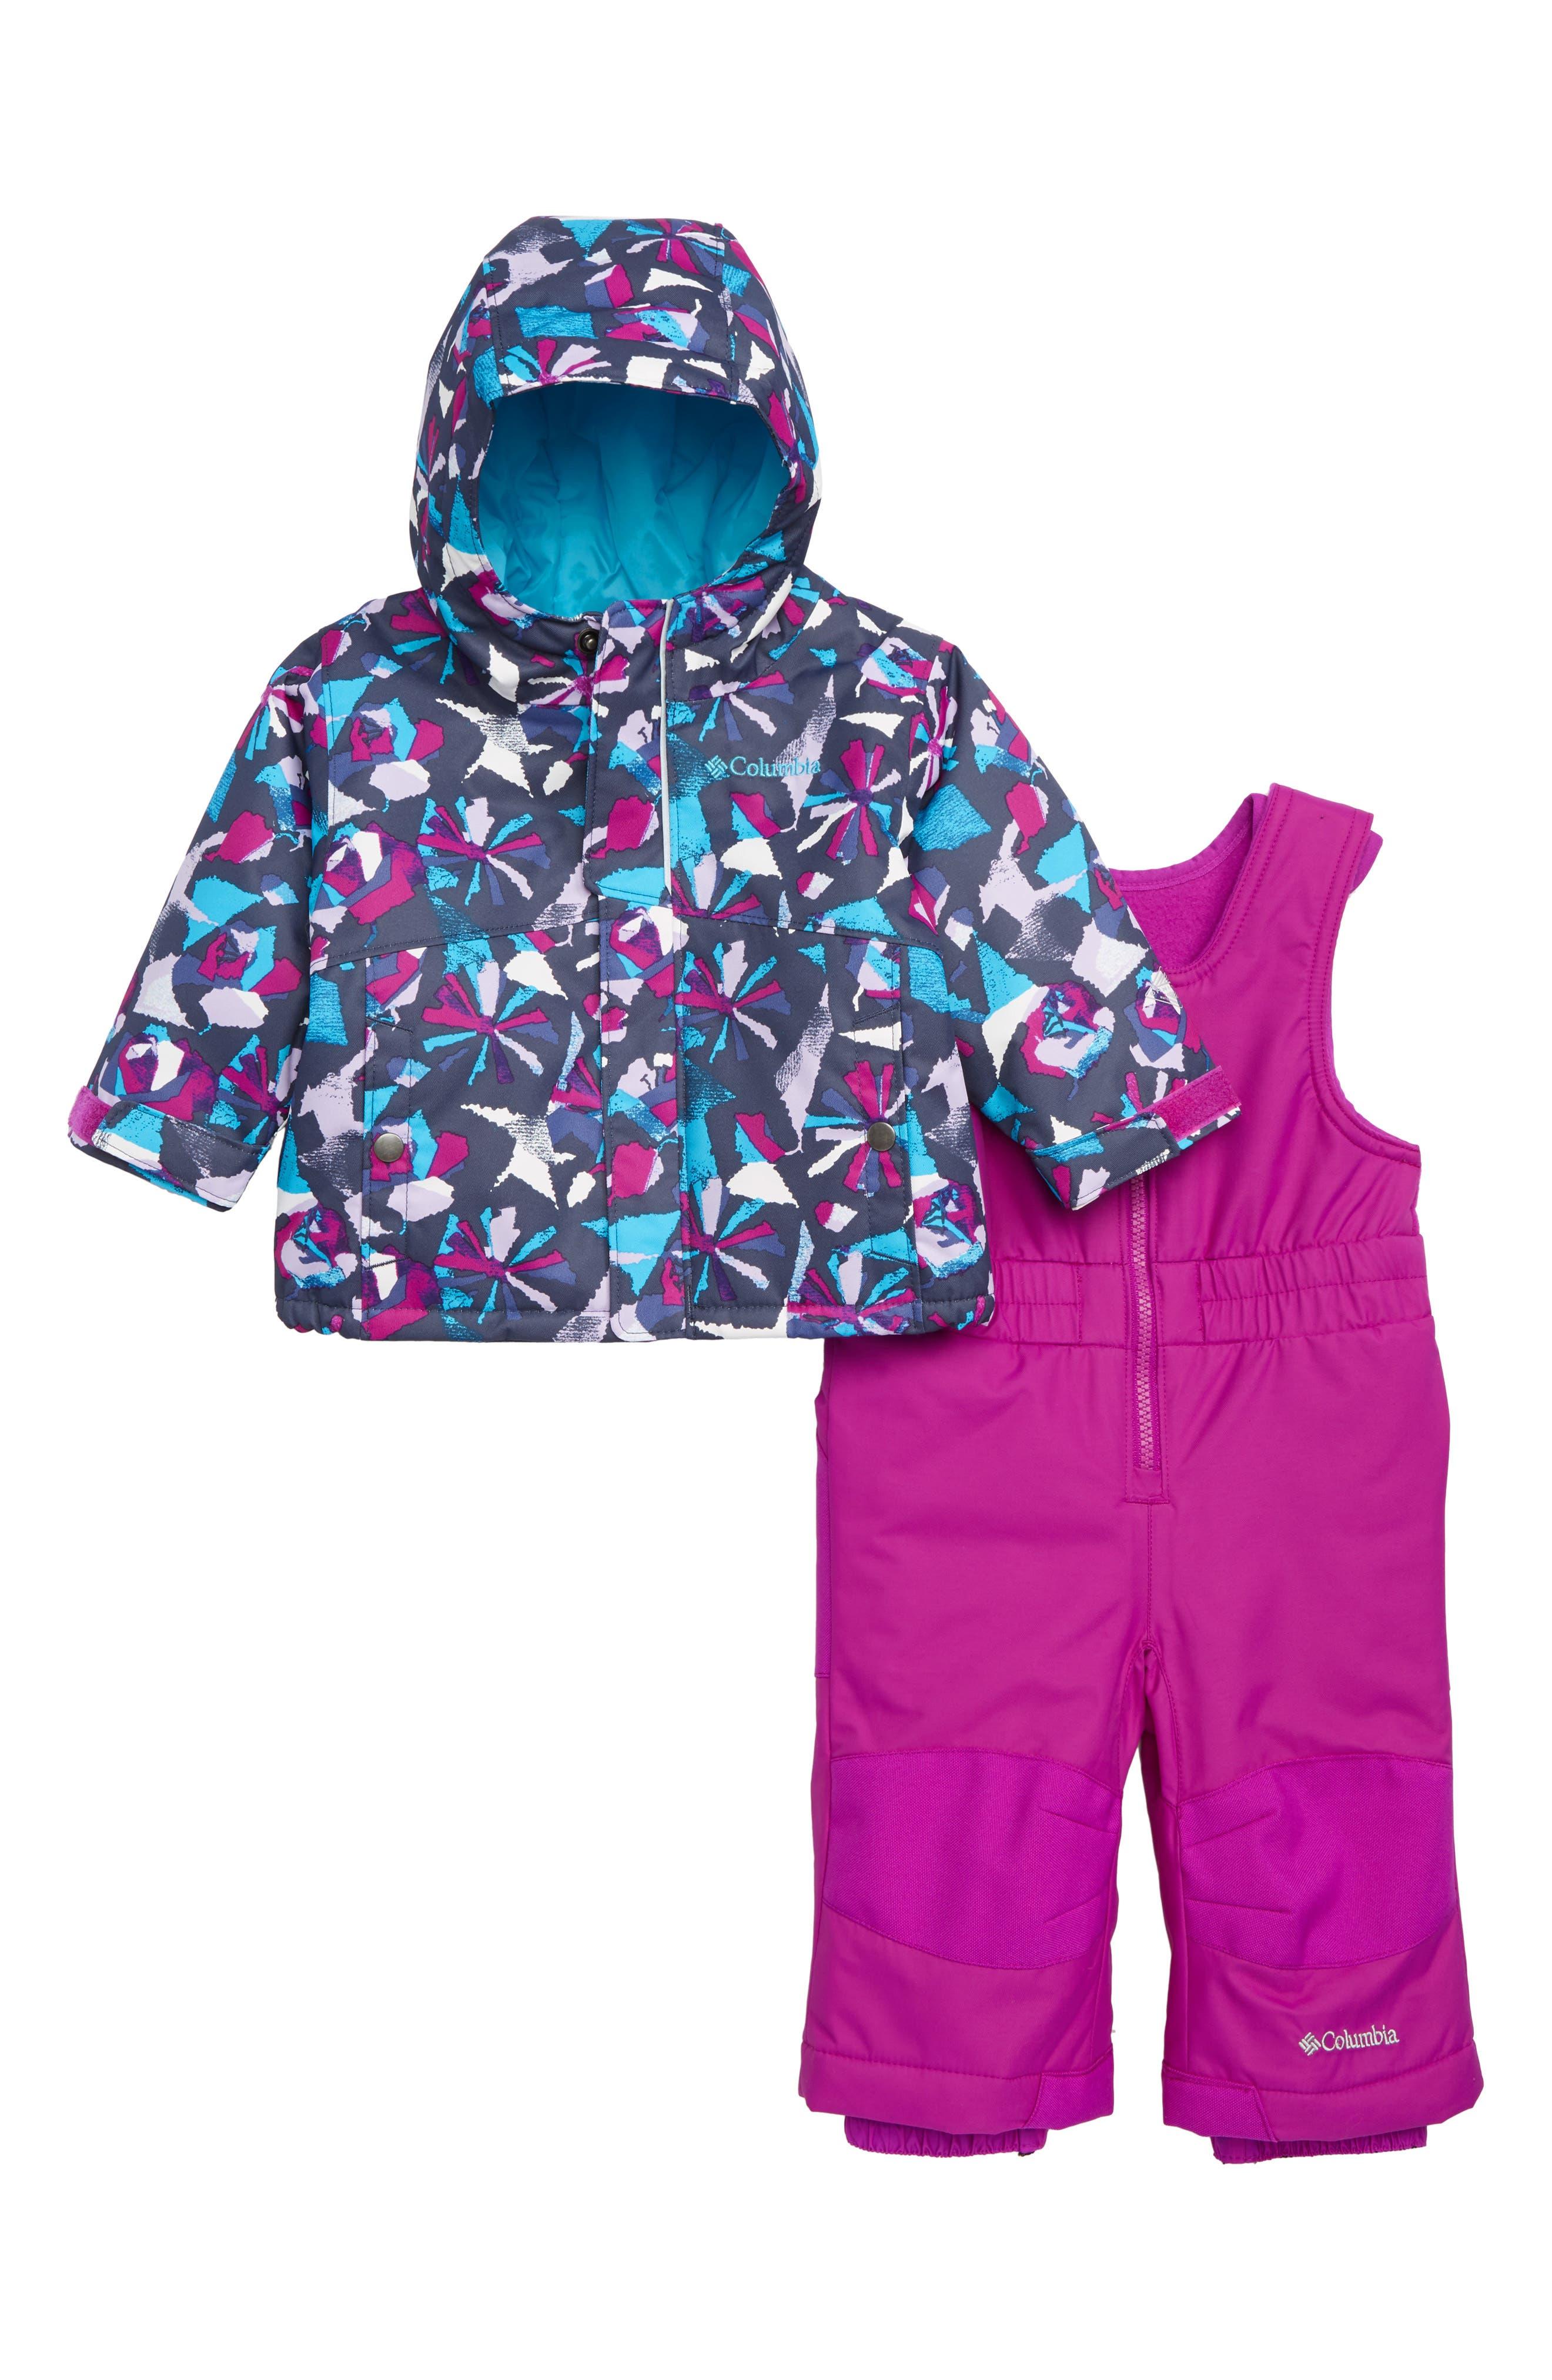 Buga Waterproof Insulated Jacket & Snow Bib,                             Main thumbnail 1, color,                             BRIGHT PLUM PINWHEEL